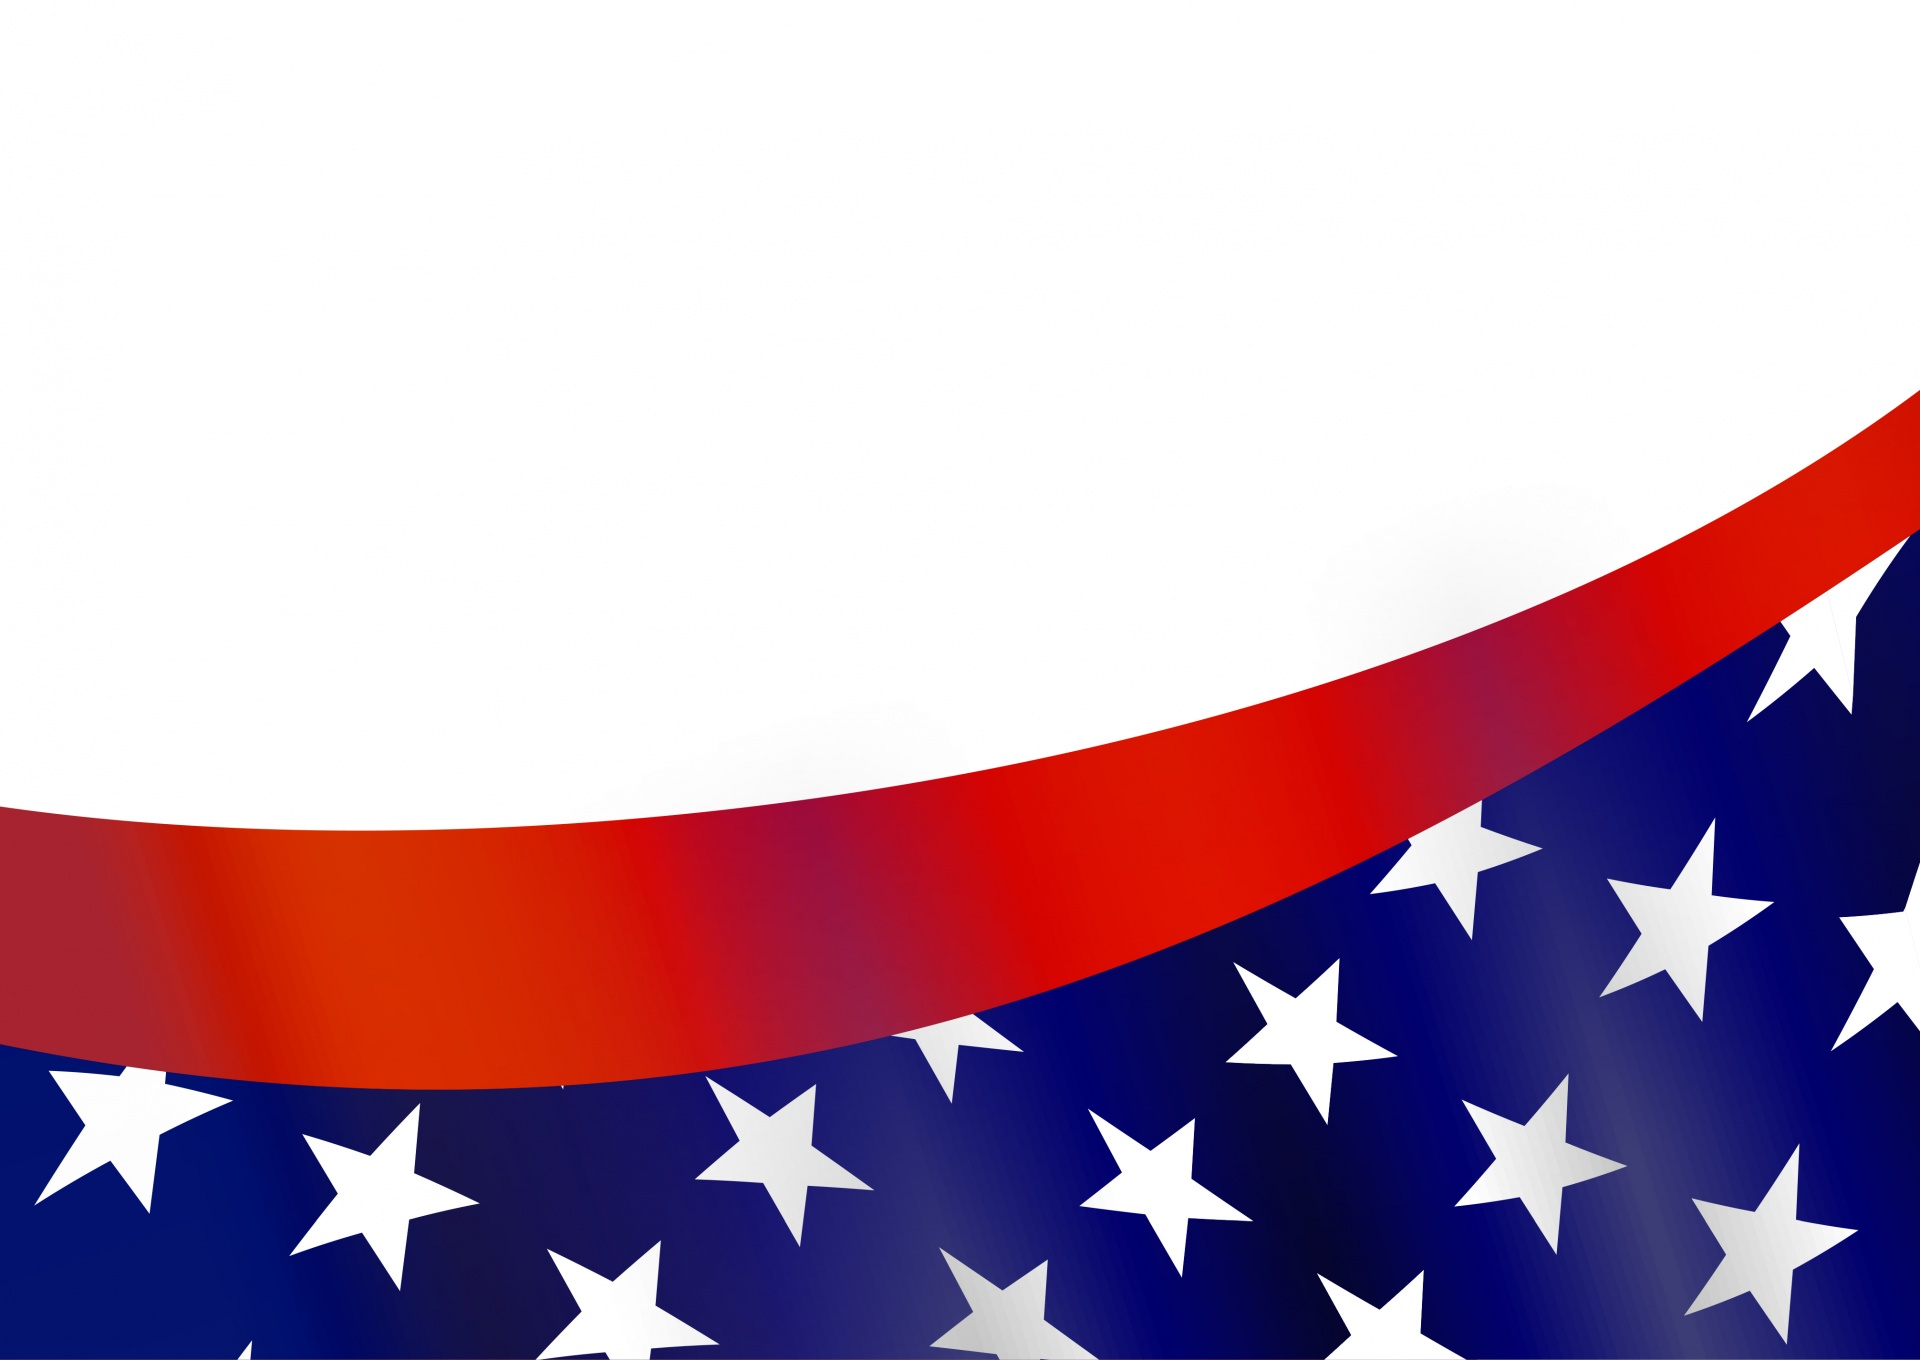 American flag free stock. America clipart border